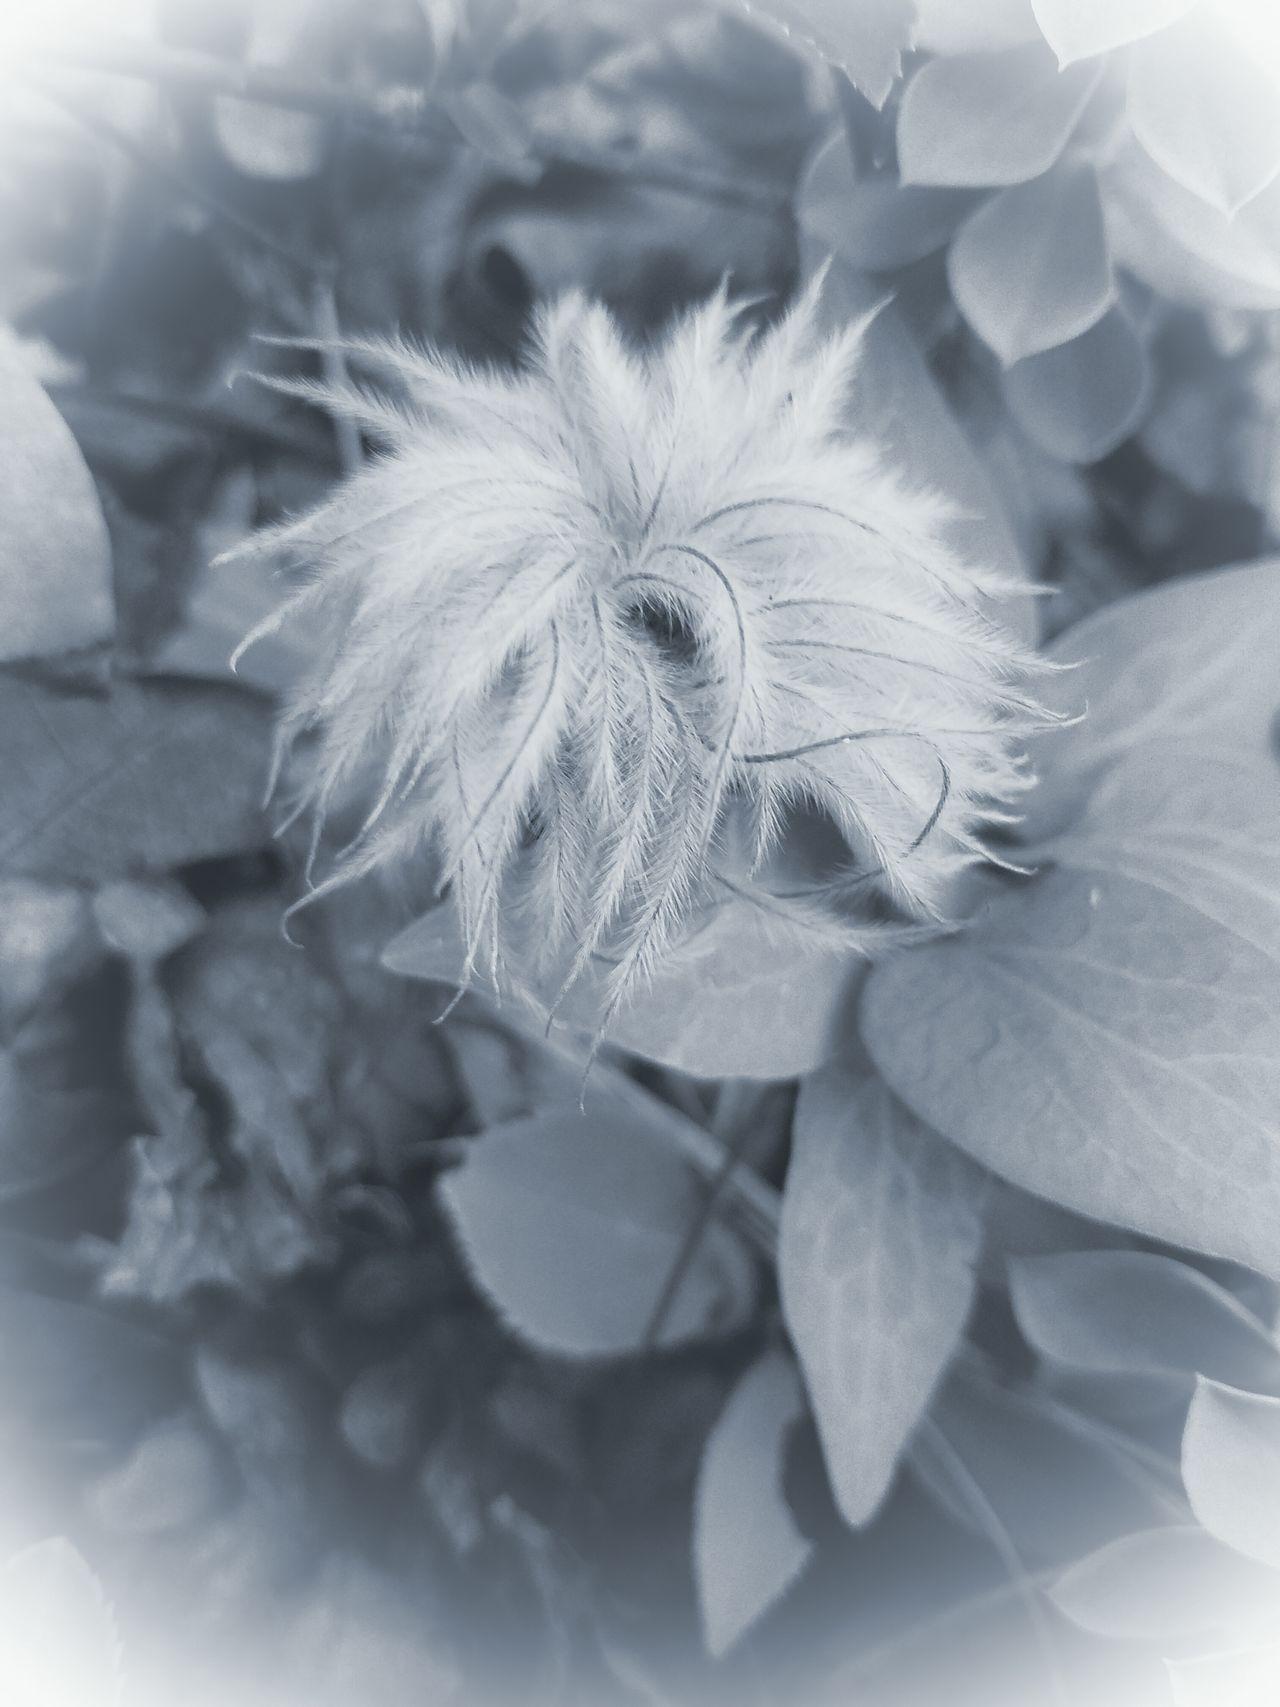 FLuFFY PASSION FLOWER Dry Flower  MUR WHITE Still Life Fine Art The Song Of Light Botany Beauty In Nature Fragility Softness Birdeyeview MUR B&W Monochrome Photography